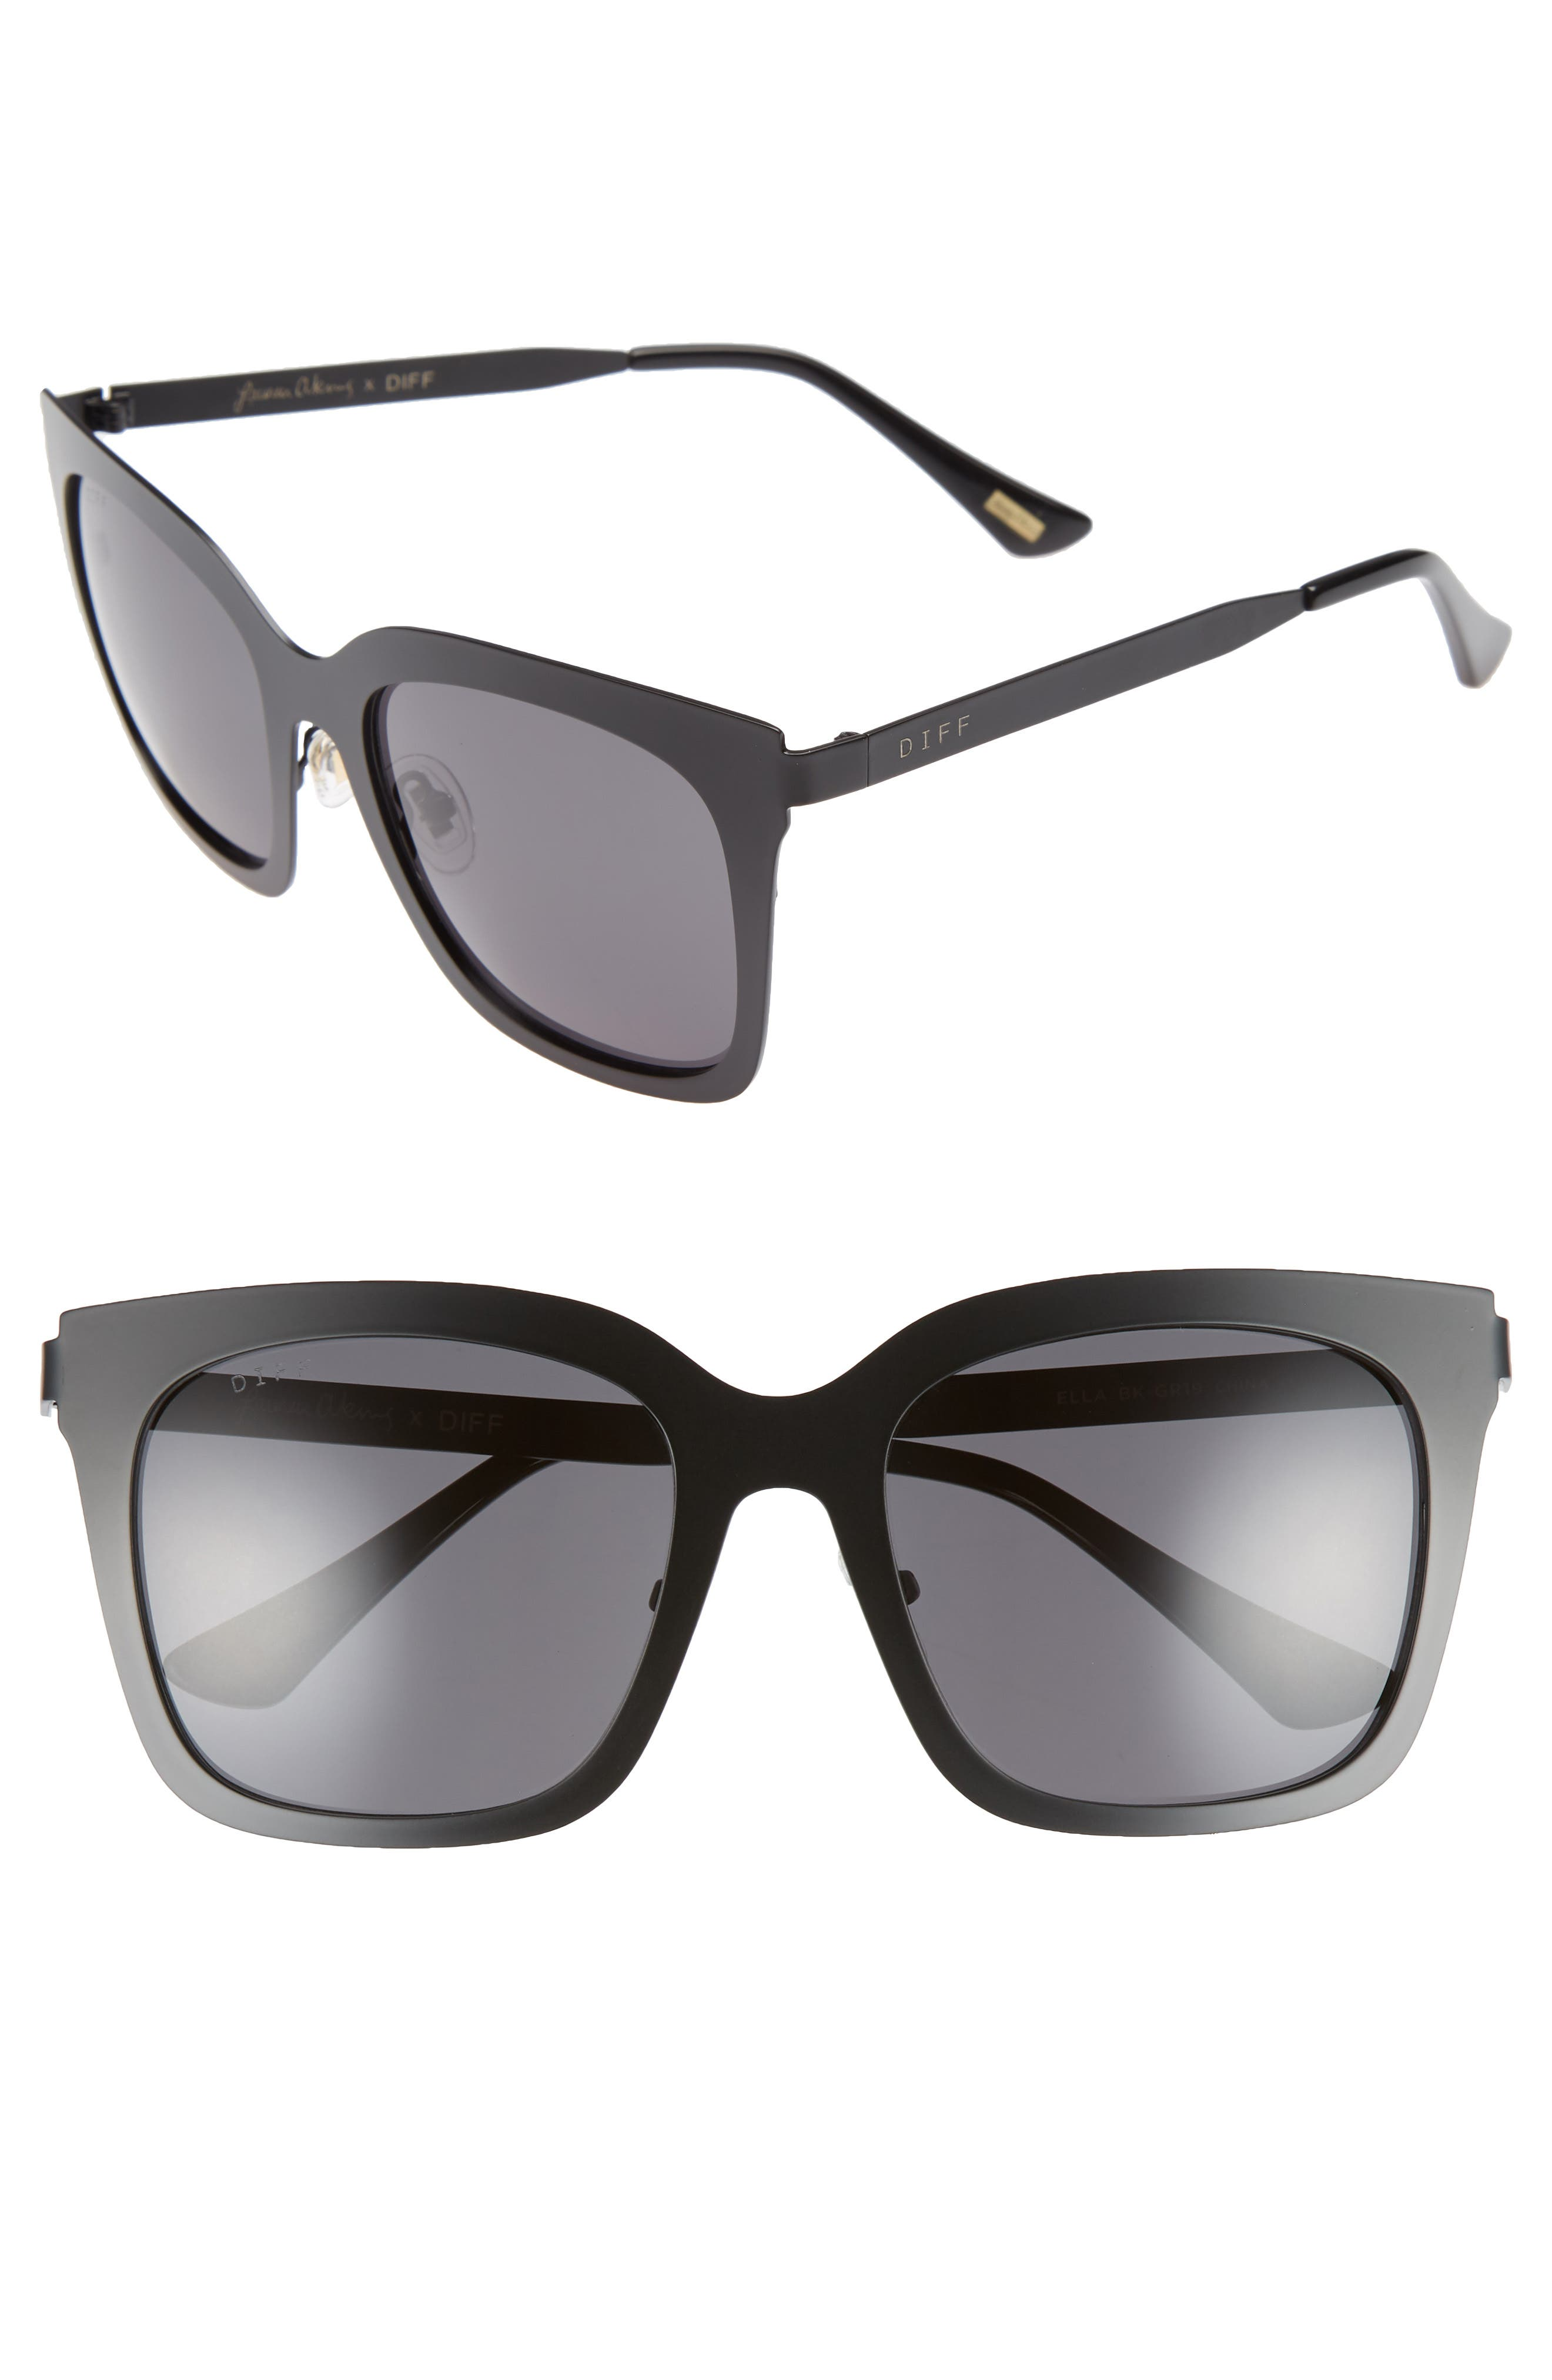 x Lauren Akins Ella 53mm Cat Eye Sunglasses,                             Main thumbnail 1, color,                             BLACK/ GREY